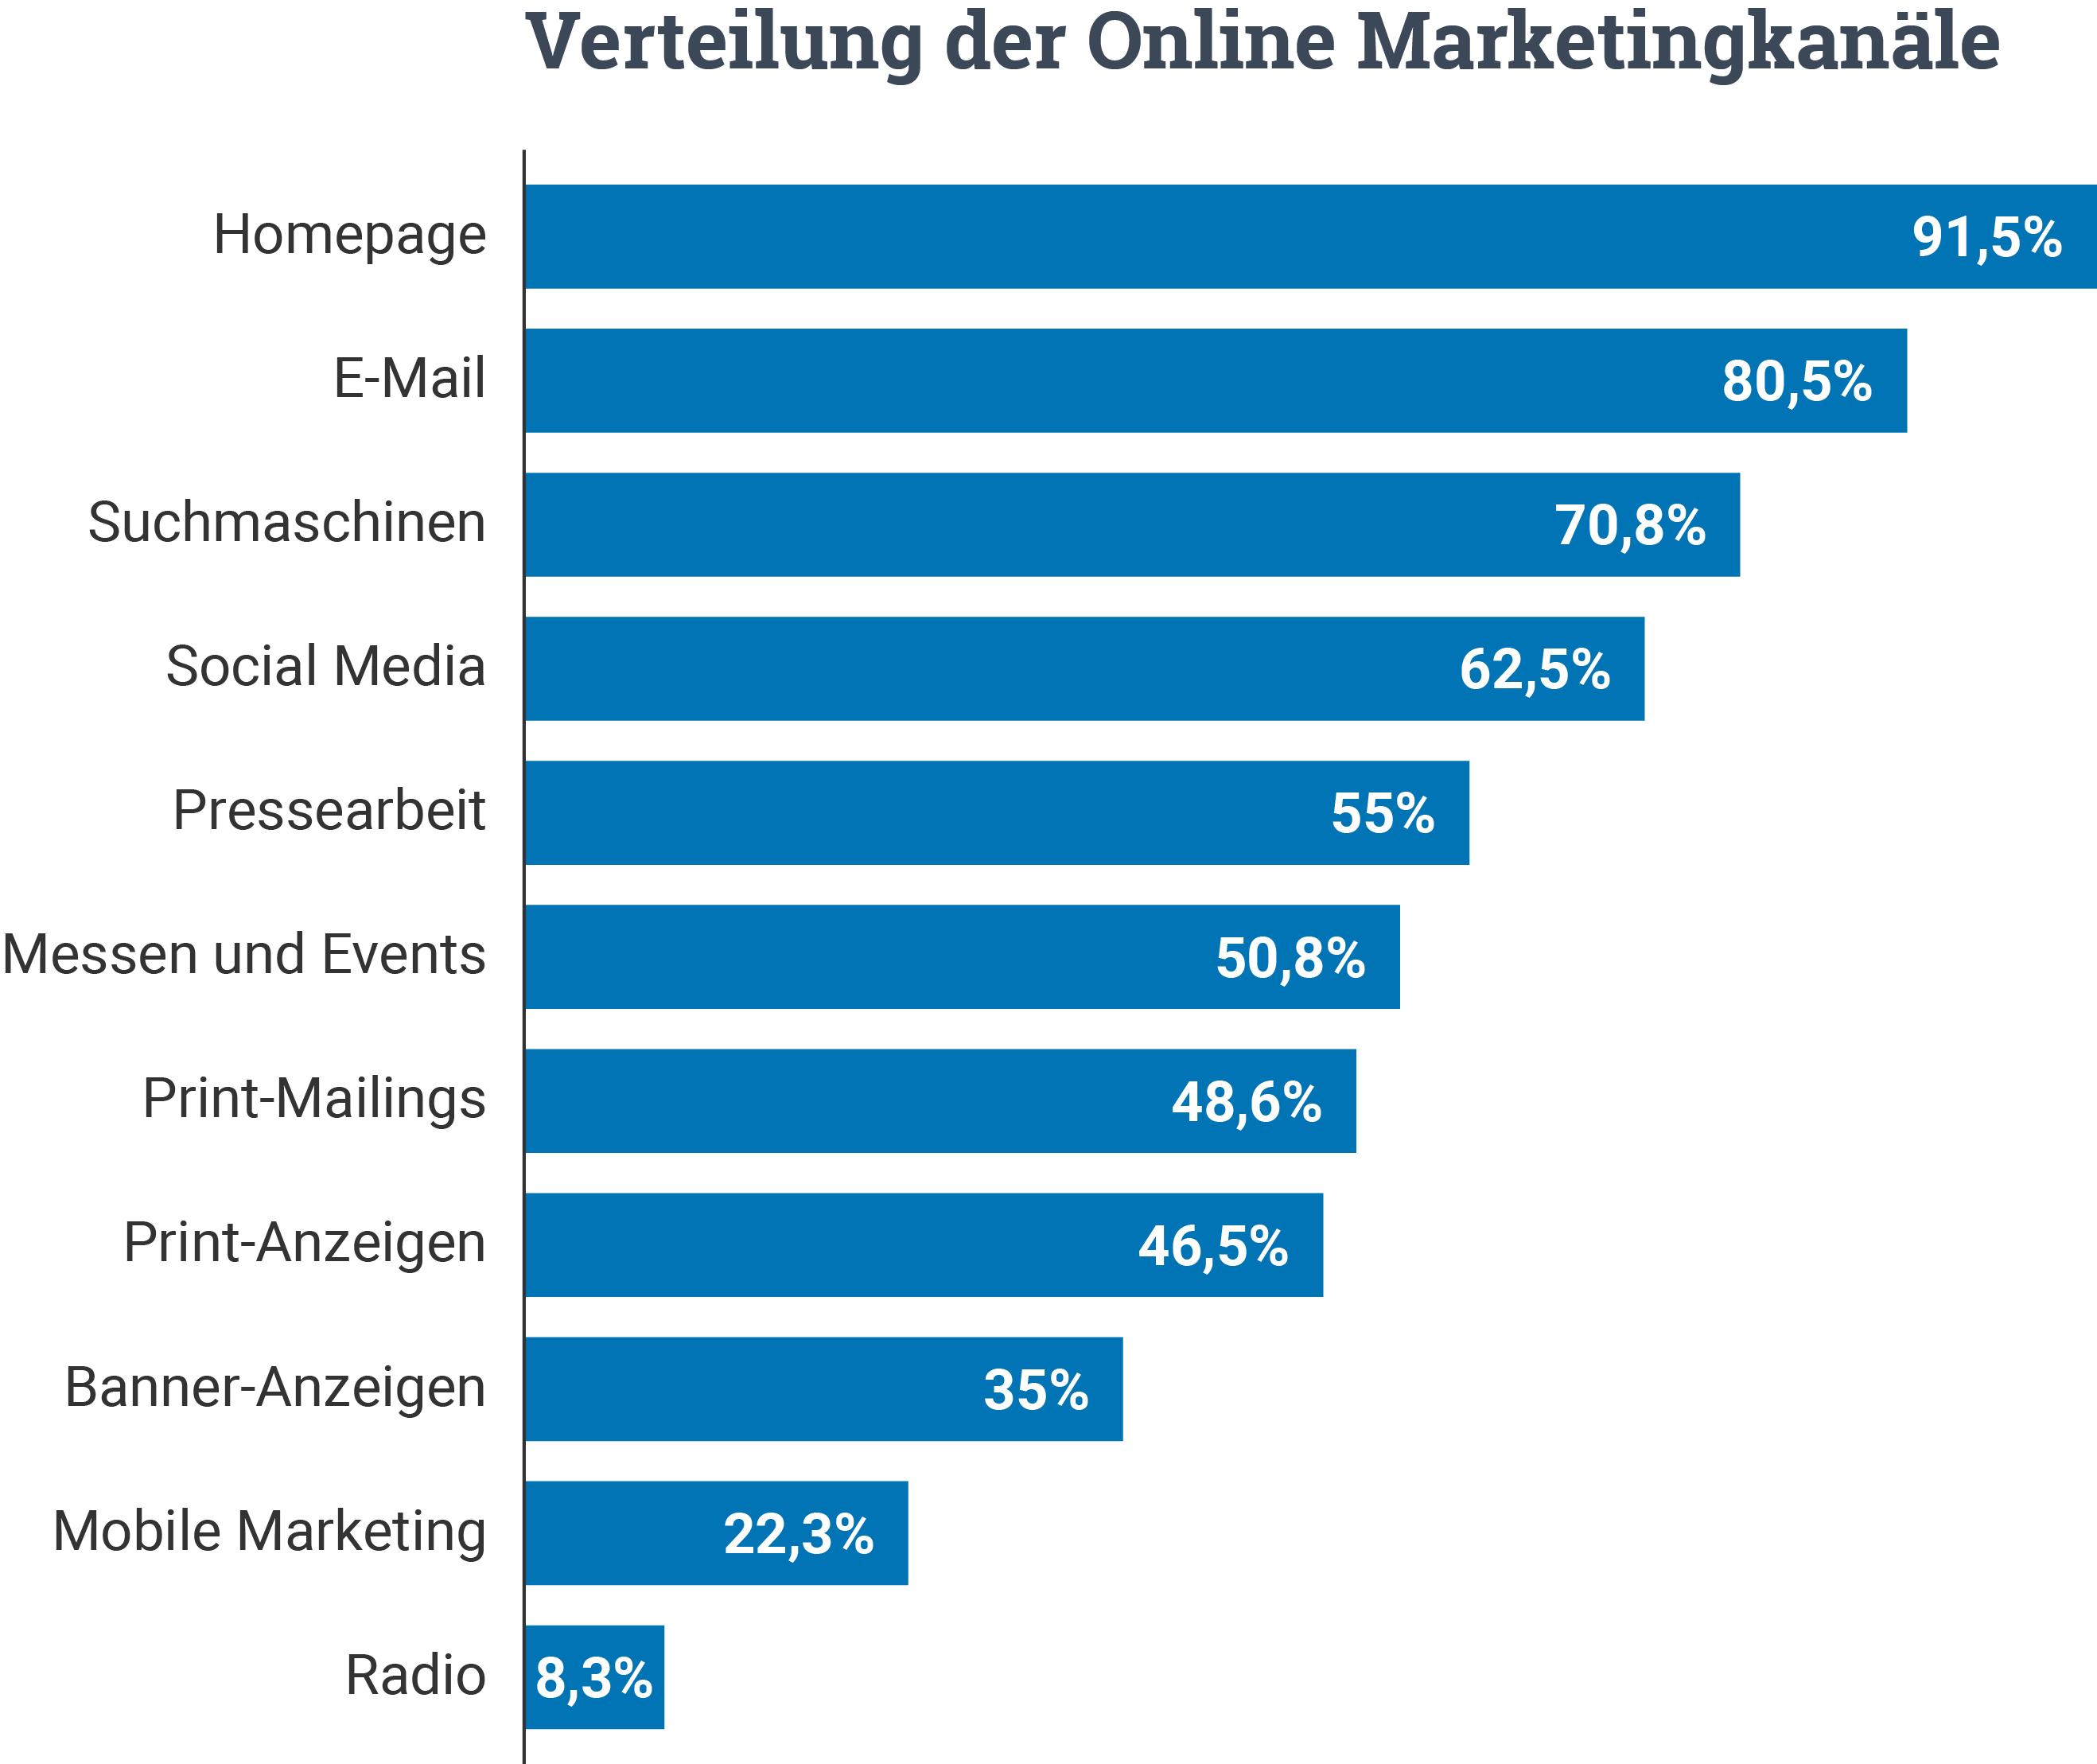 Verteilung Online Marketingkanäle Statistik